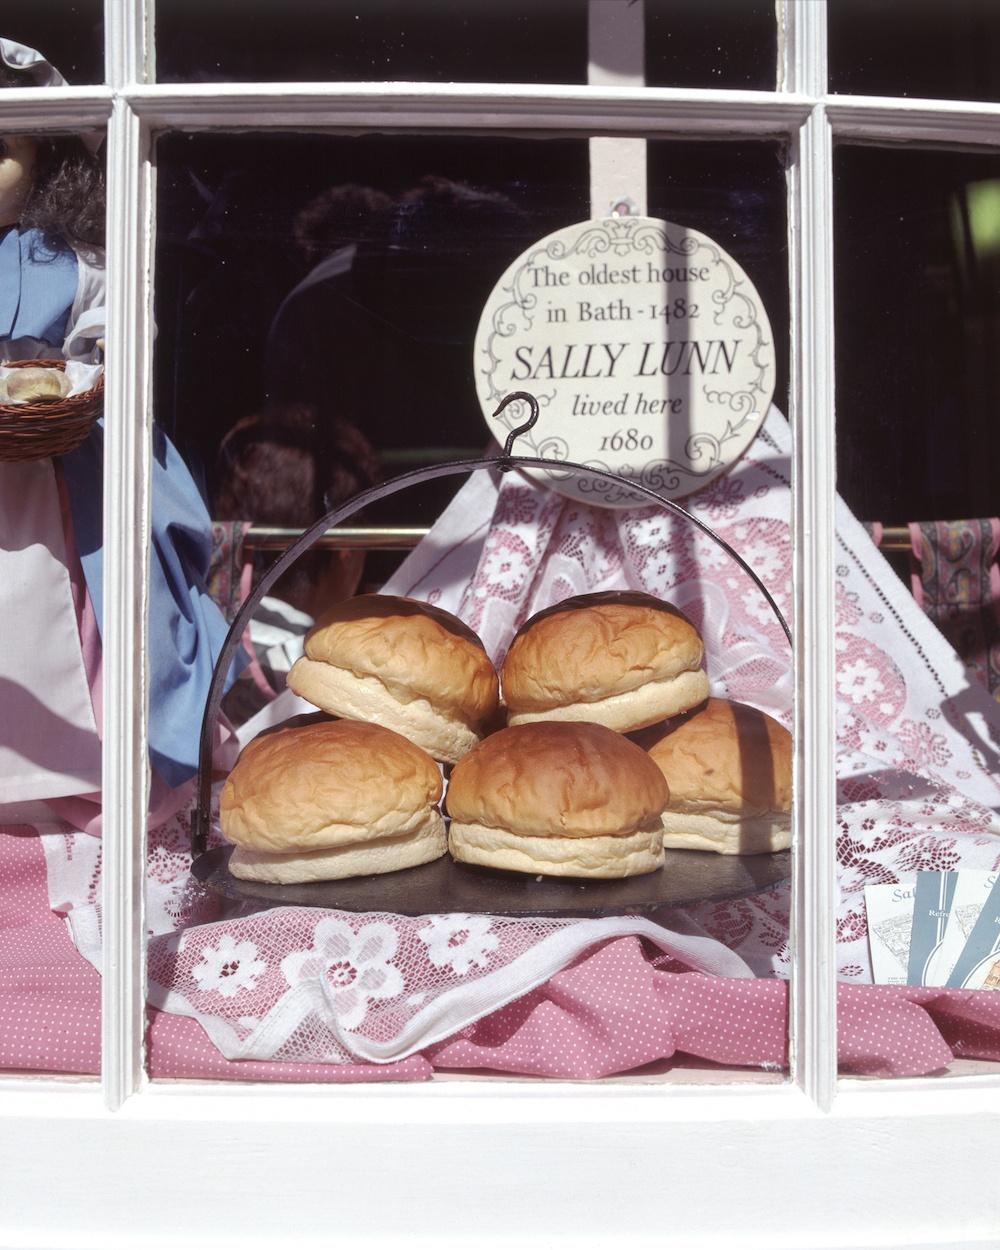 Sally Lunns Bath England City Guide